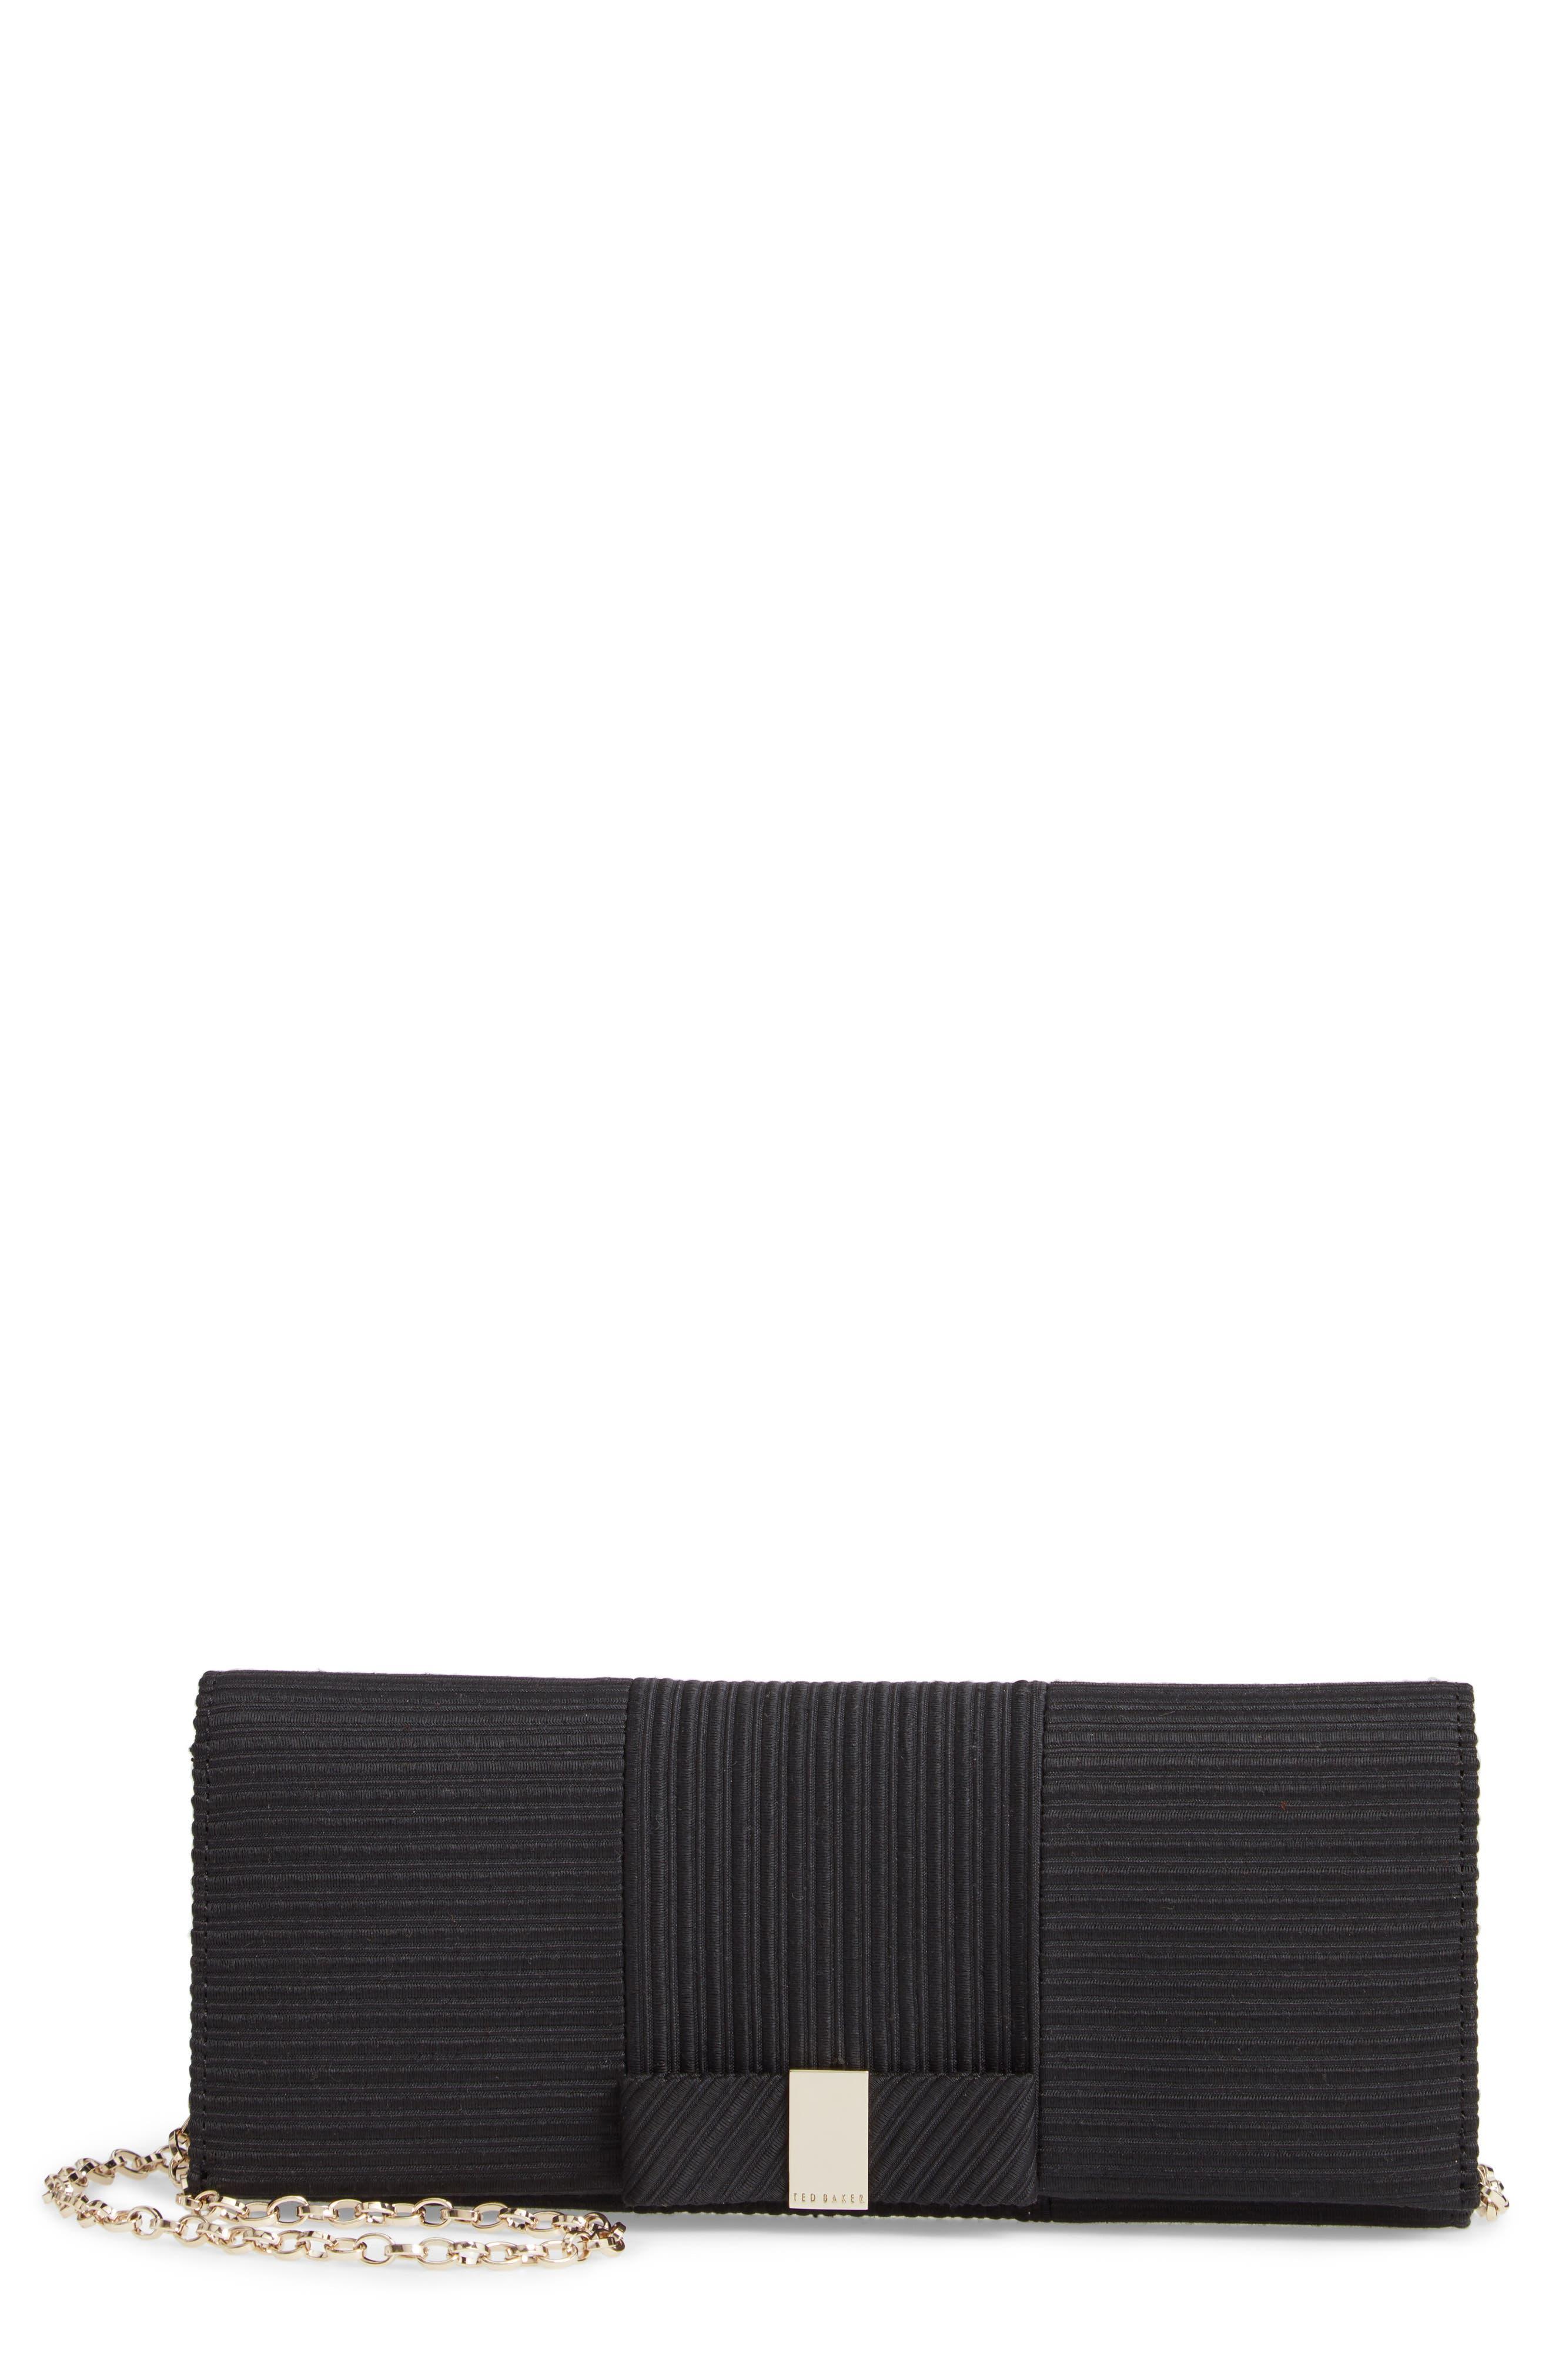 Emilee Bow Evening Bag,                             Main thumbnail 1, color,                             BLACK